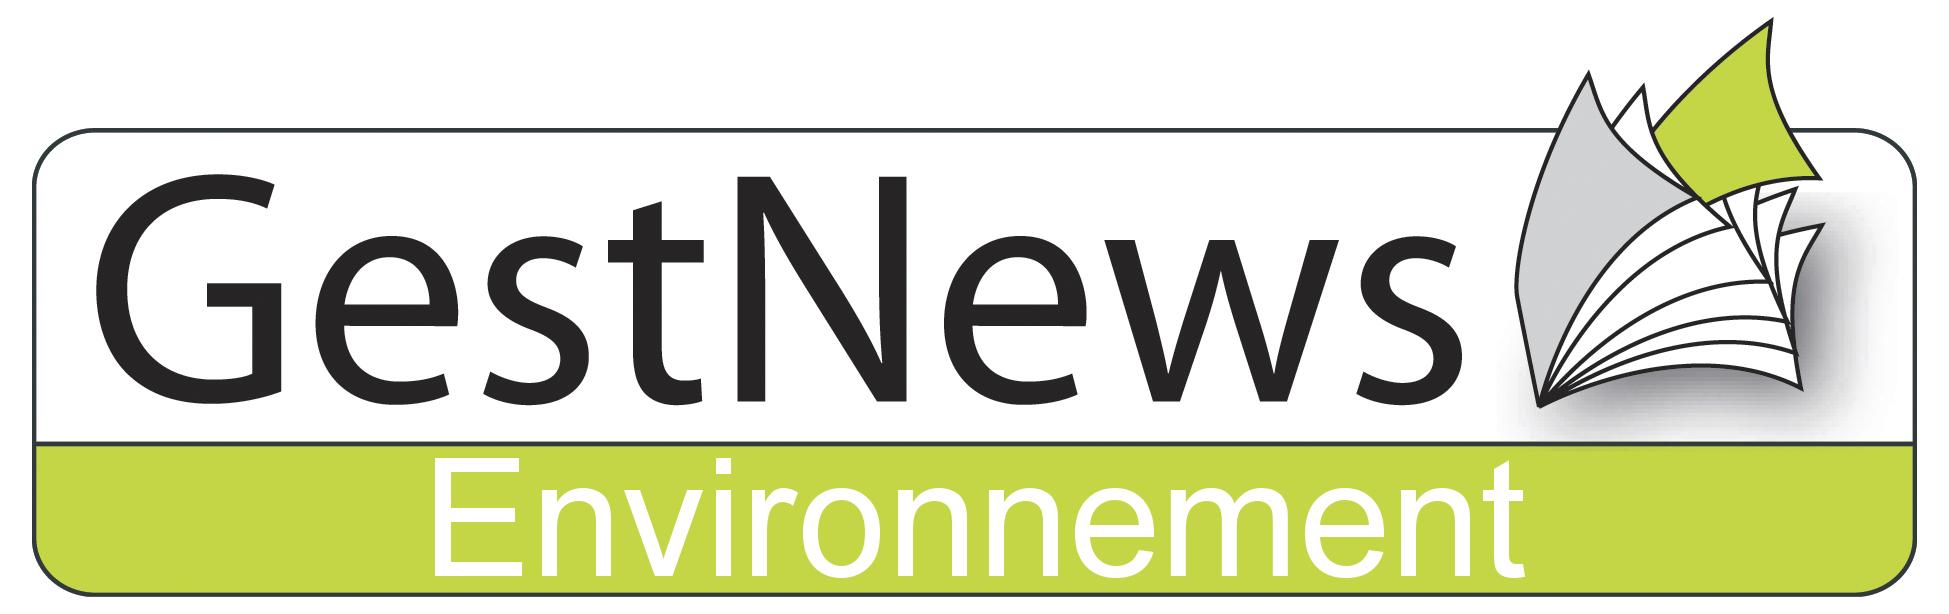 gestnews-fond-vert-300-environnement.jpg